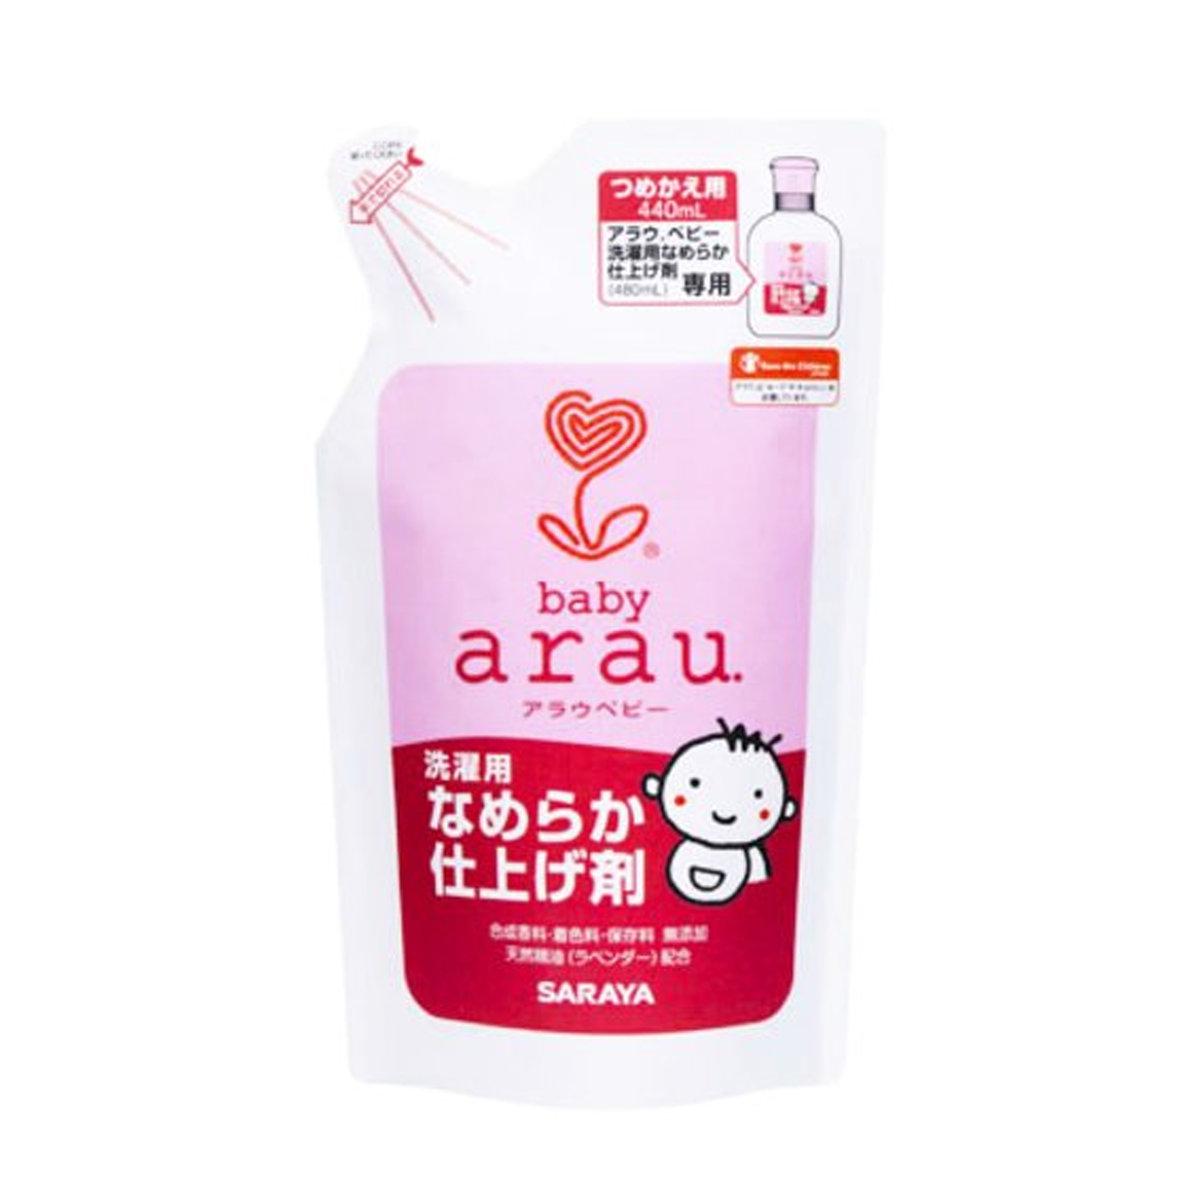 ARAU Baby Laundry Softener refill 440ml